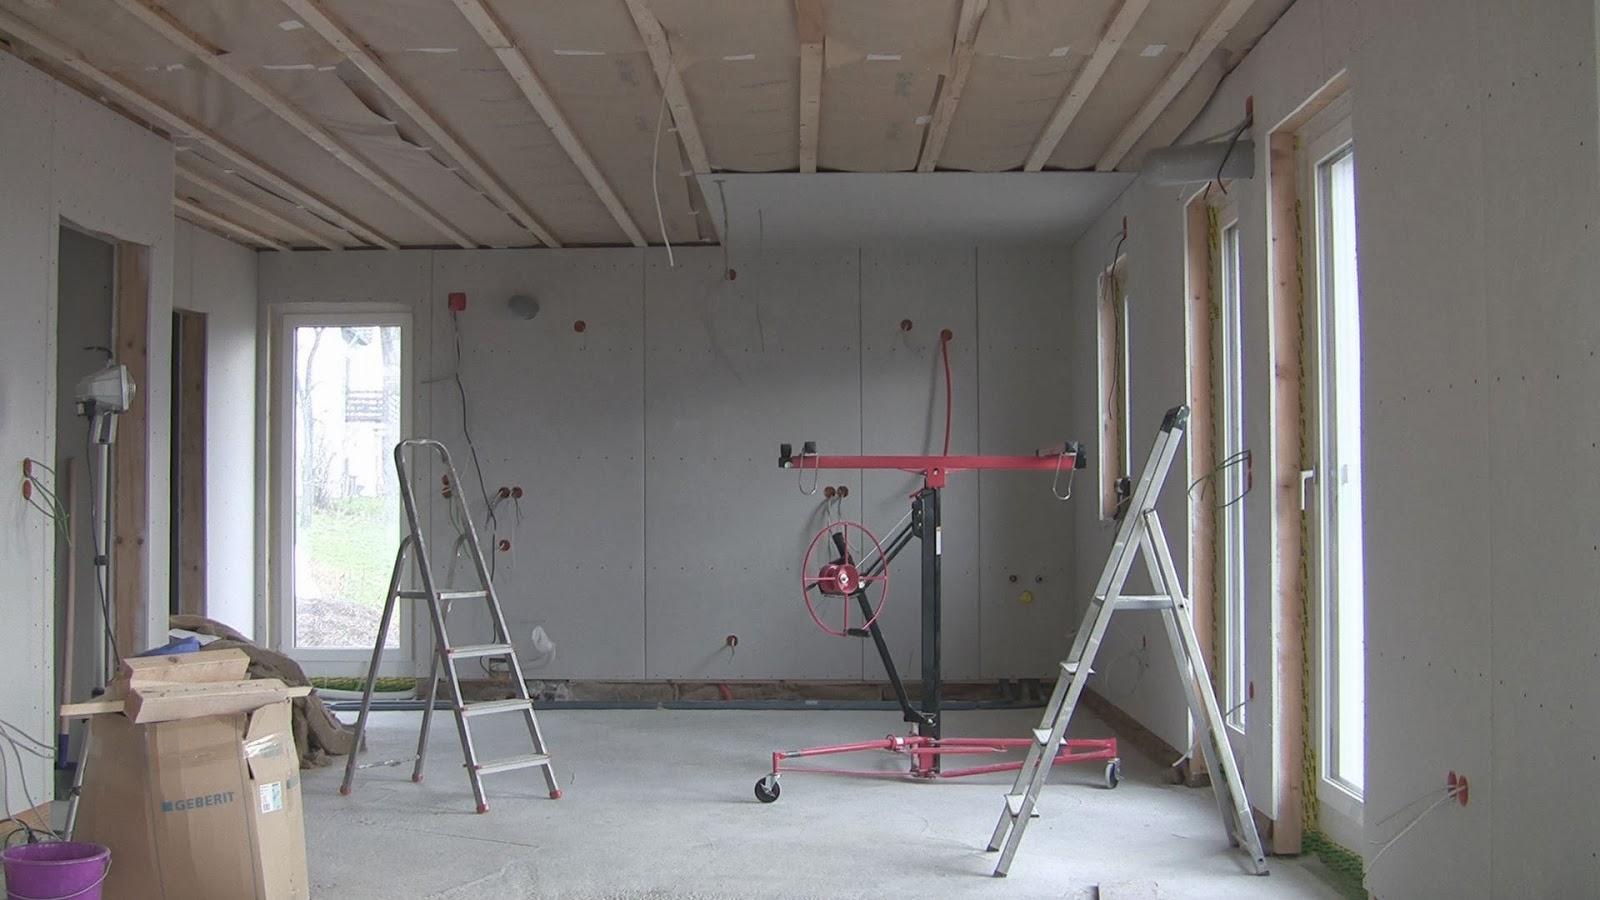 jome home bau 4s 9 gipskarton die decke. Black Bedroom Furniture Sets. Home Design Ideas